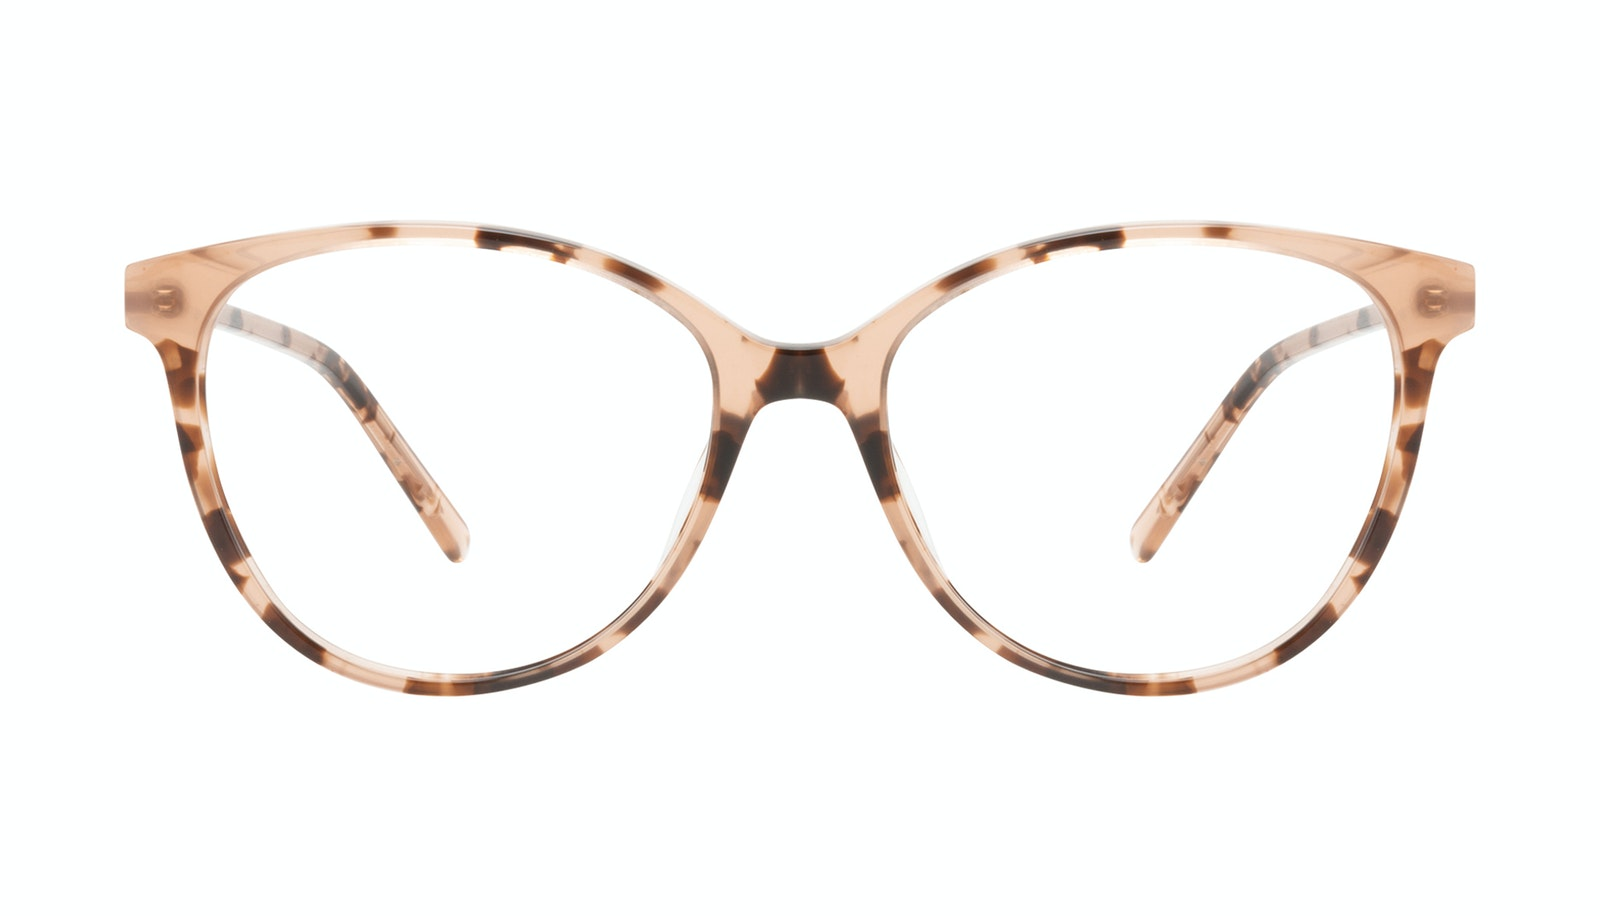 Affordable Fashion Glasses Round Eyeglasses Women Imagine II Plus Tortie